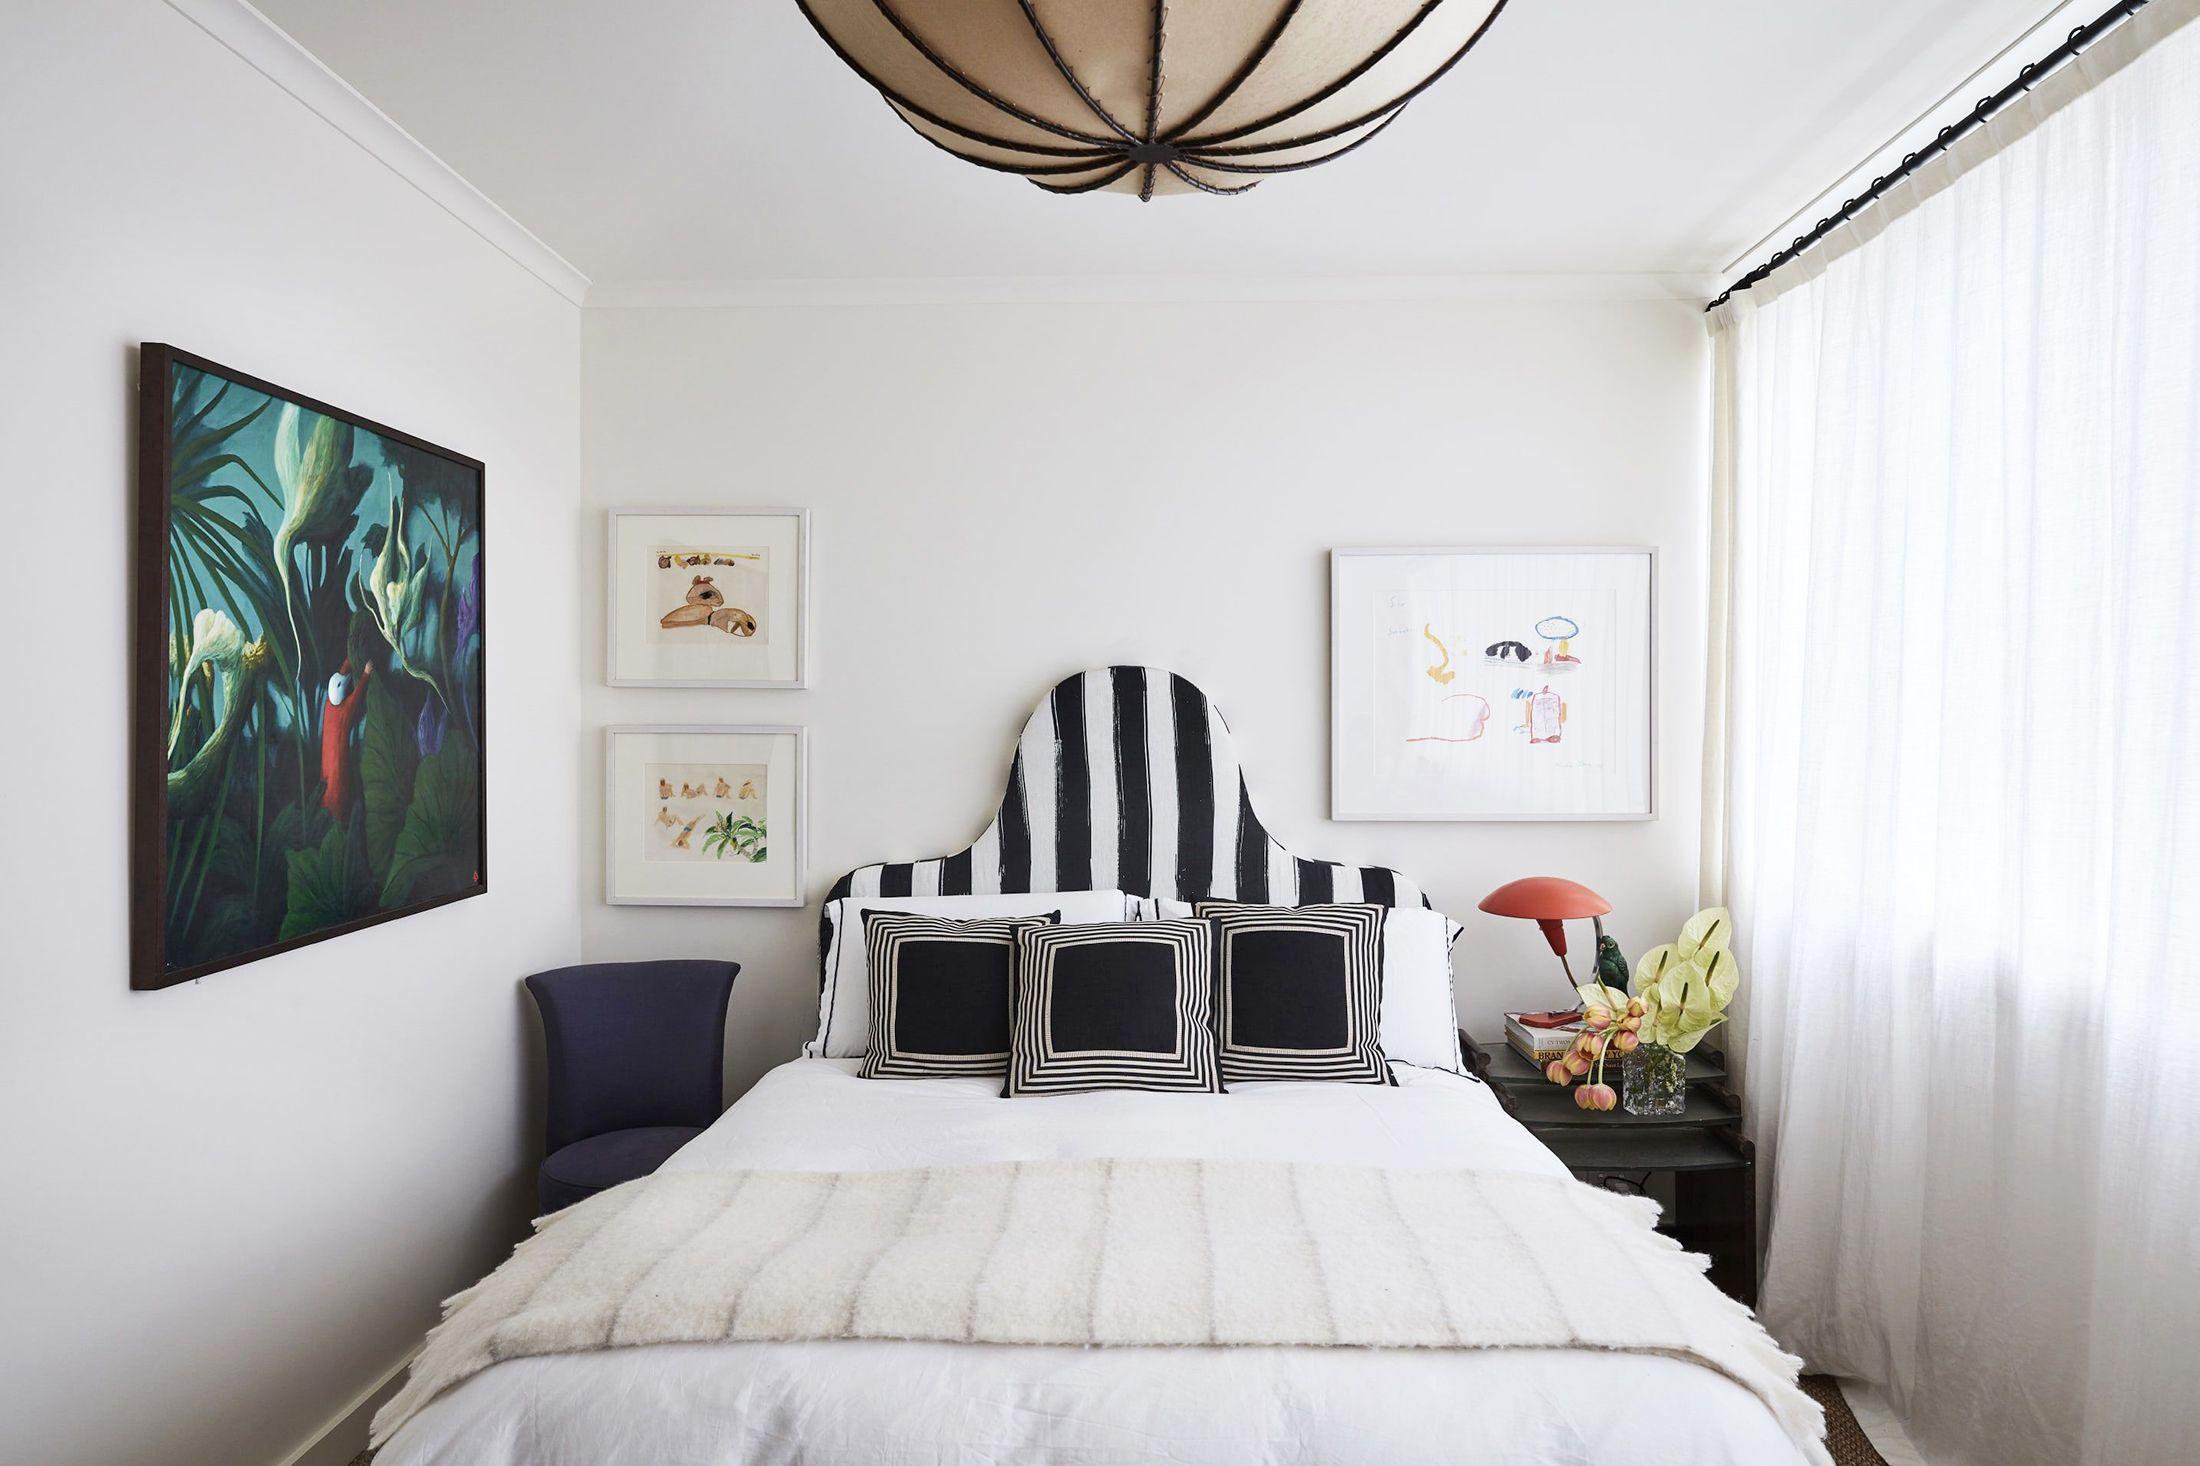 19 Best Bedroom Wall Decor Ideas in 2020 - Bedroom Wall ... on Bedroom Wall Decor  id=15238